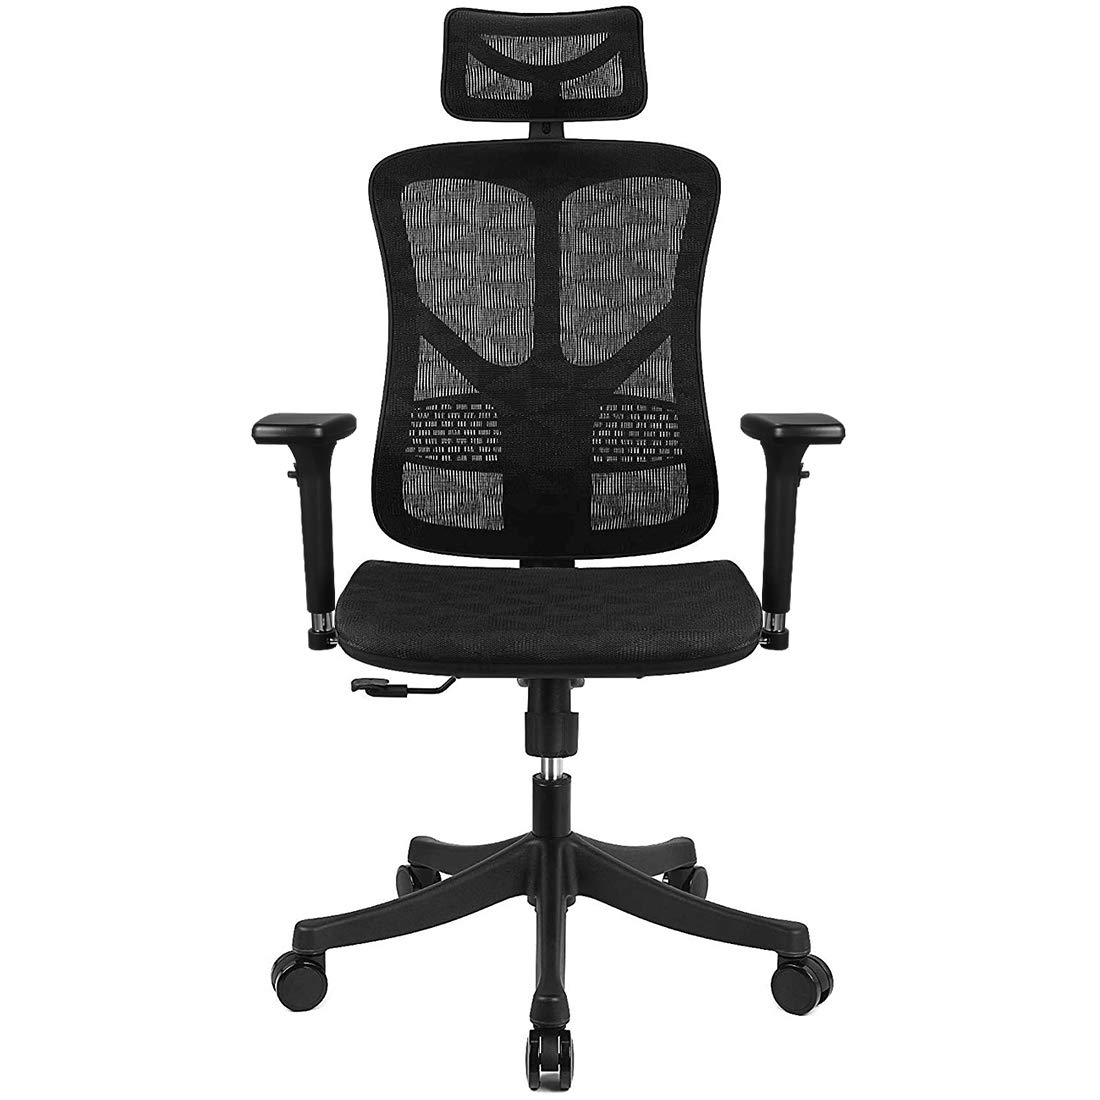 Argomax Ergonomic Mesh Office Chair High Back with Adjustable Headrest Tilt Back Tension Lumbar Support 3D Armrest Seat High End Argomax Computer Desk Chair 360 Swivel Self Classic